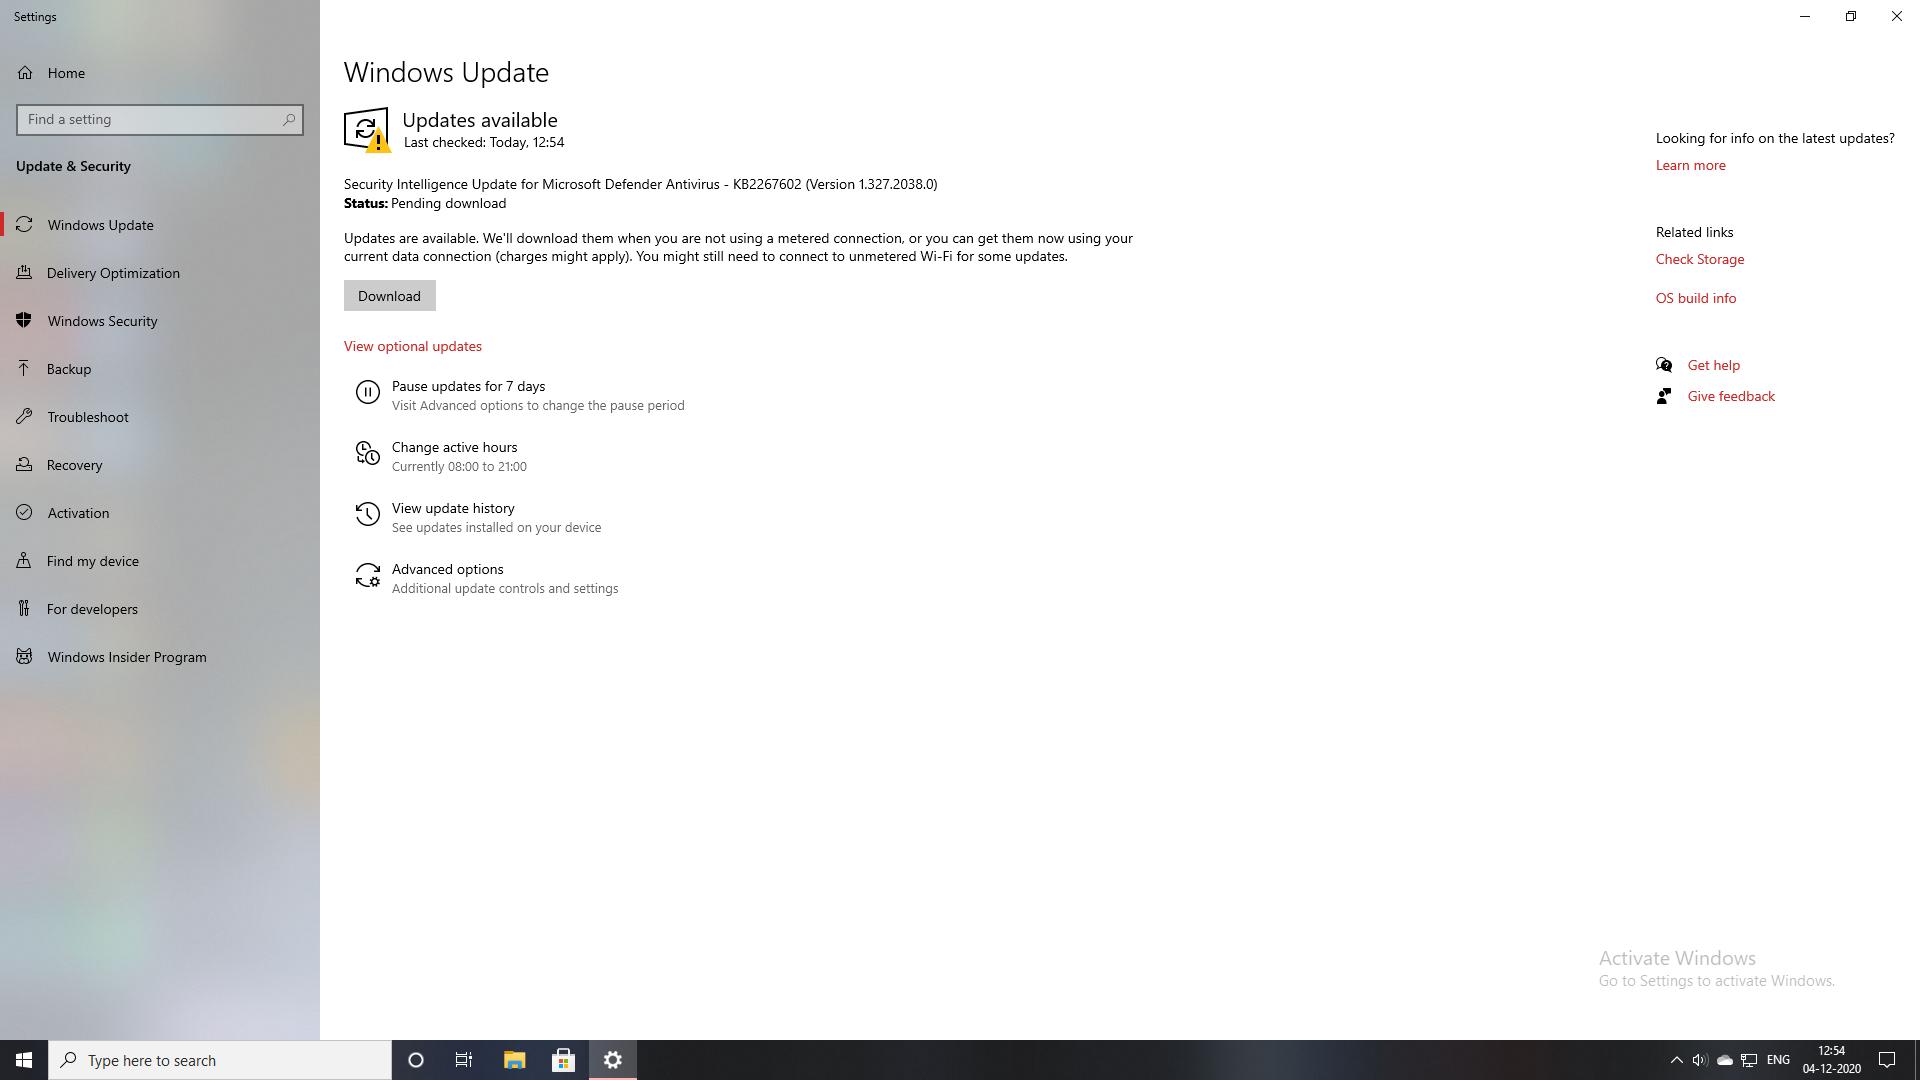 Windows Update Problems 3f99f1f5-c697-4492-aae3-130ef12c0083?upload=true.png